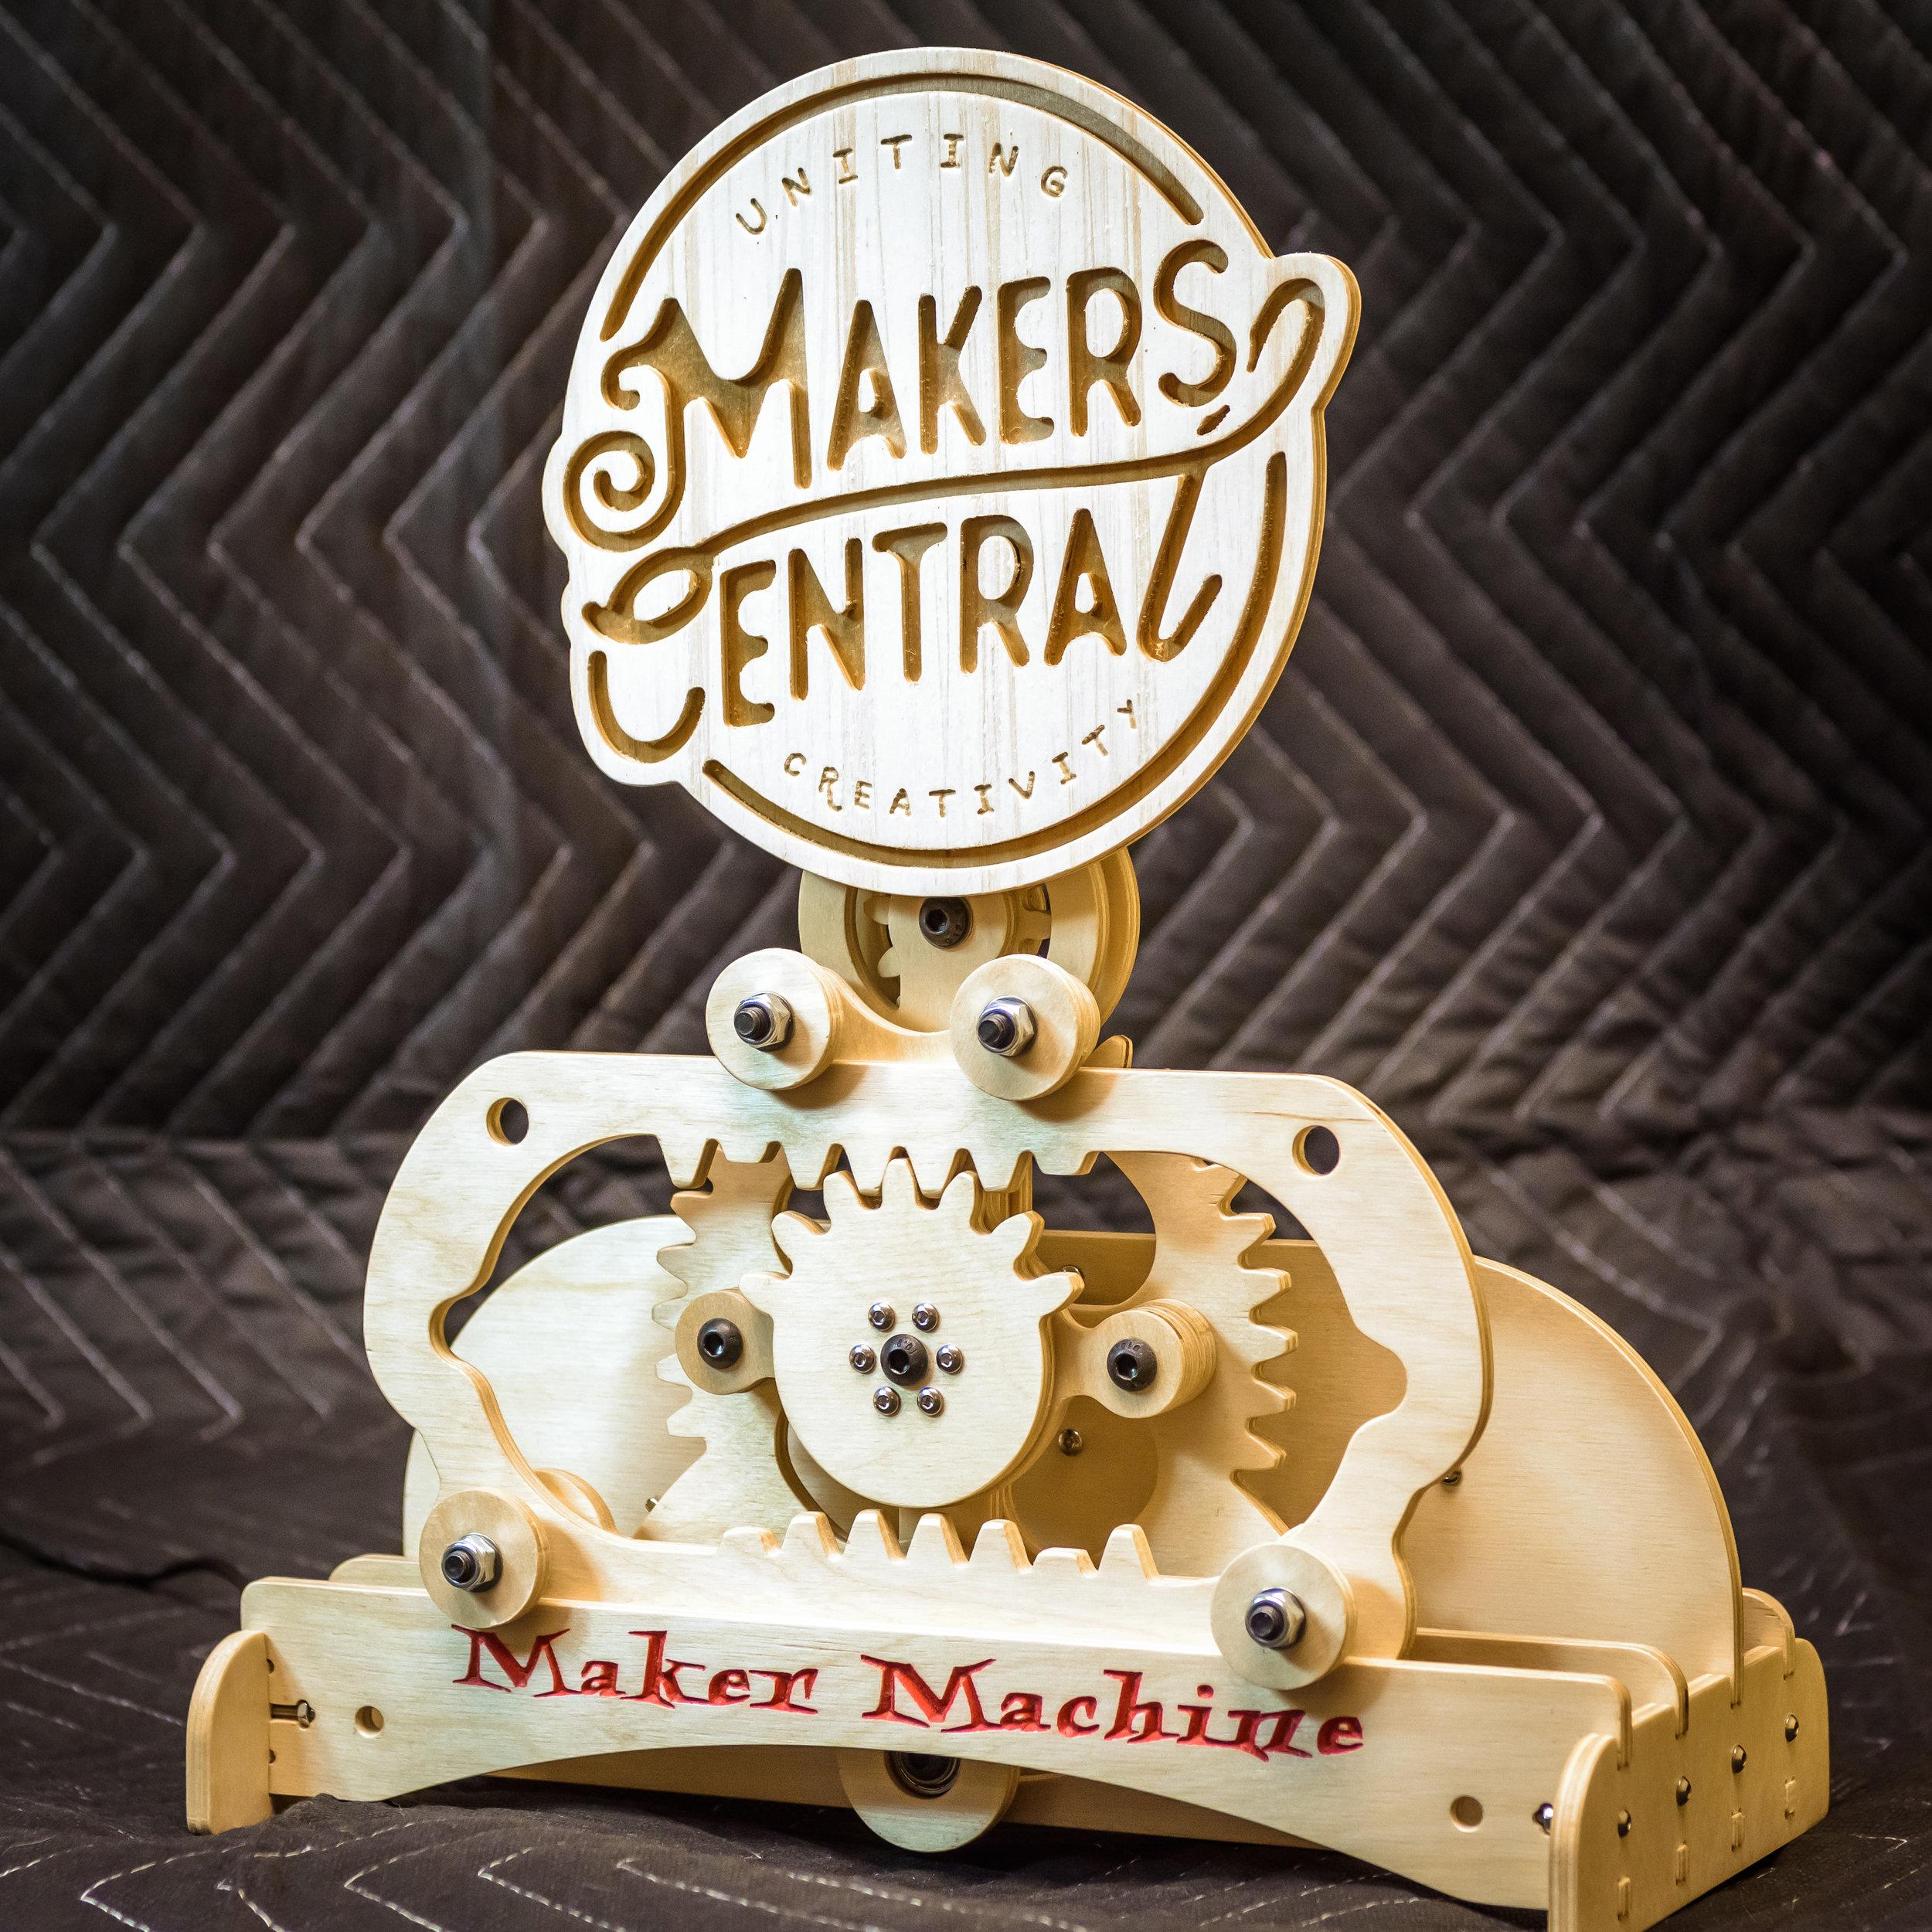 MAKER MACHINE v2-0548.jpg